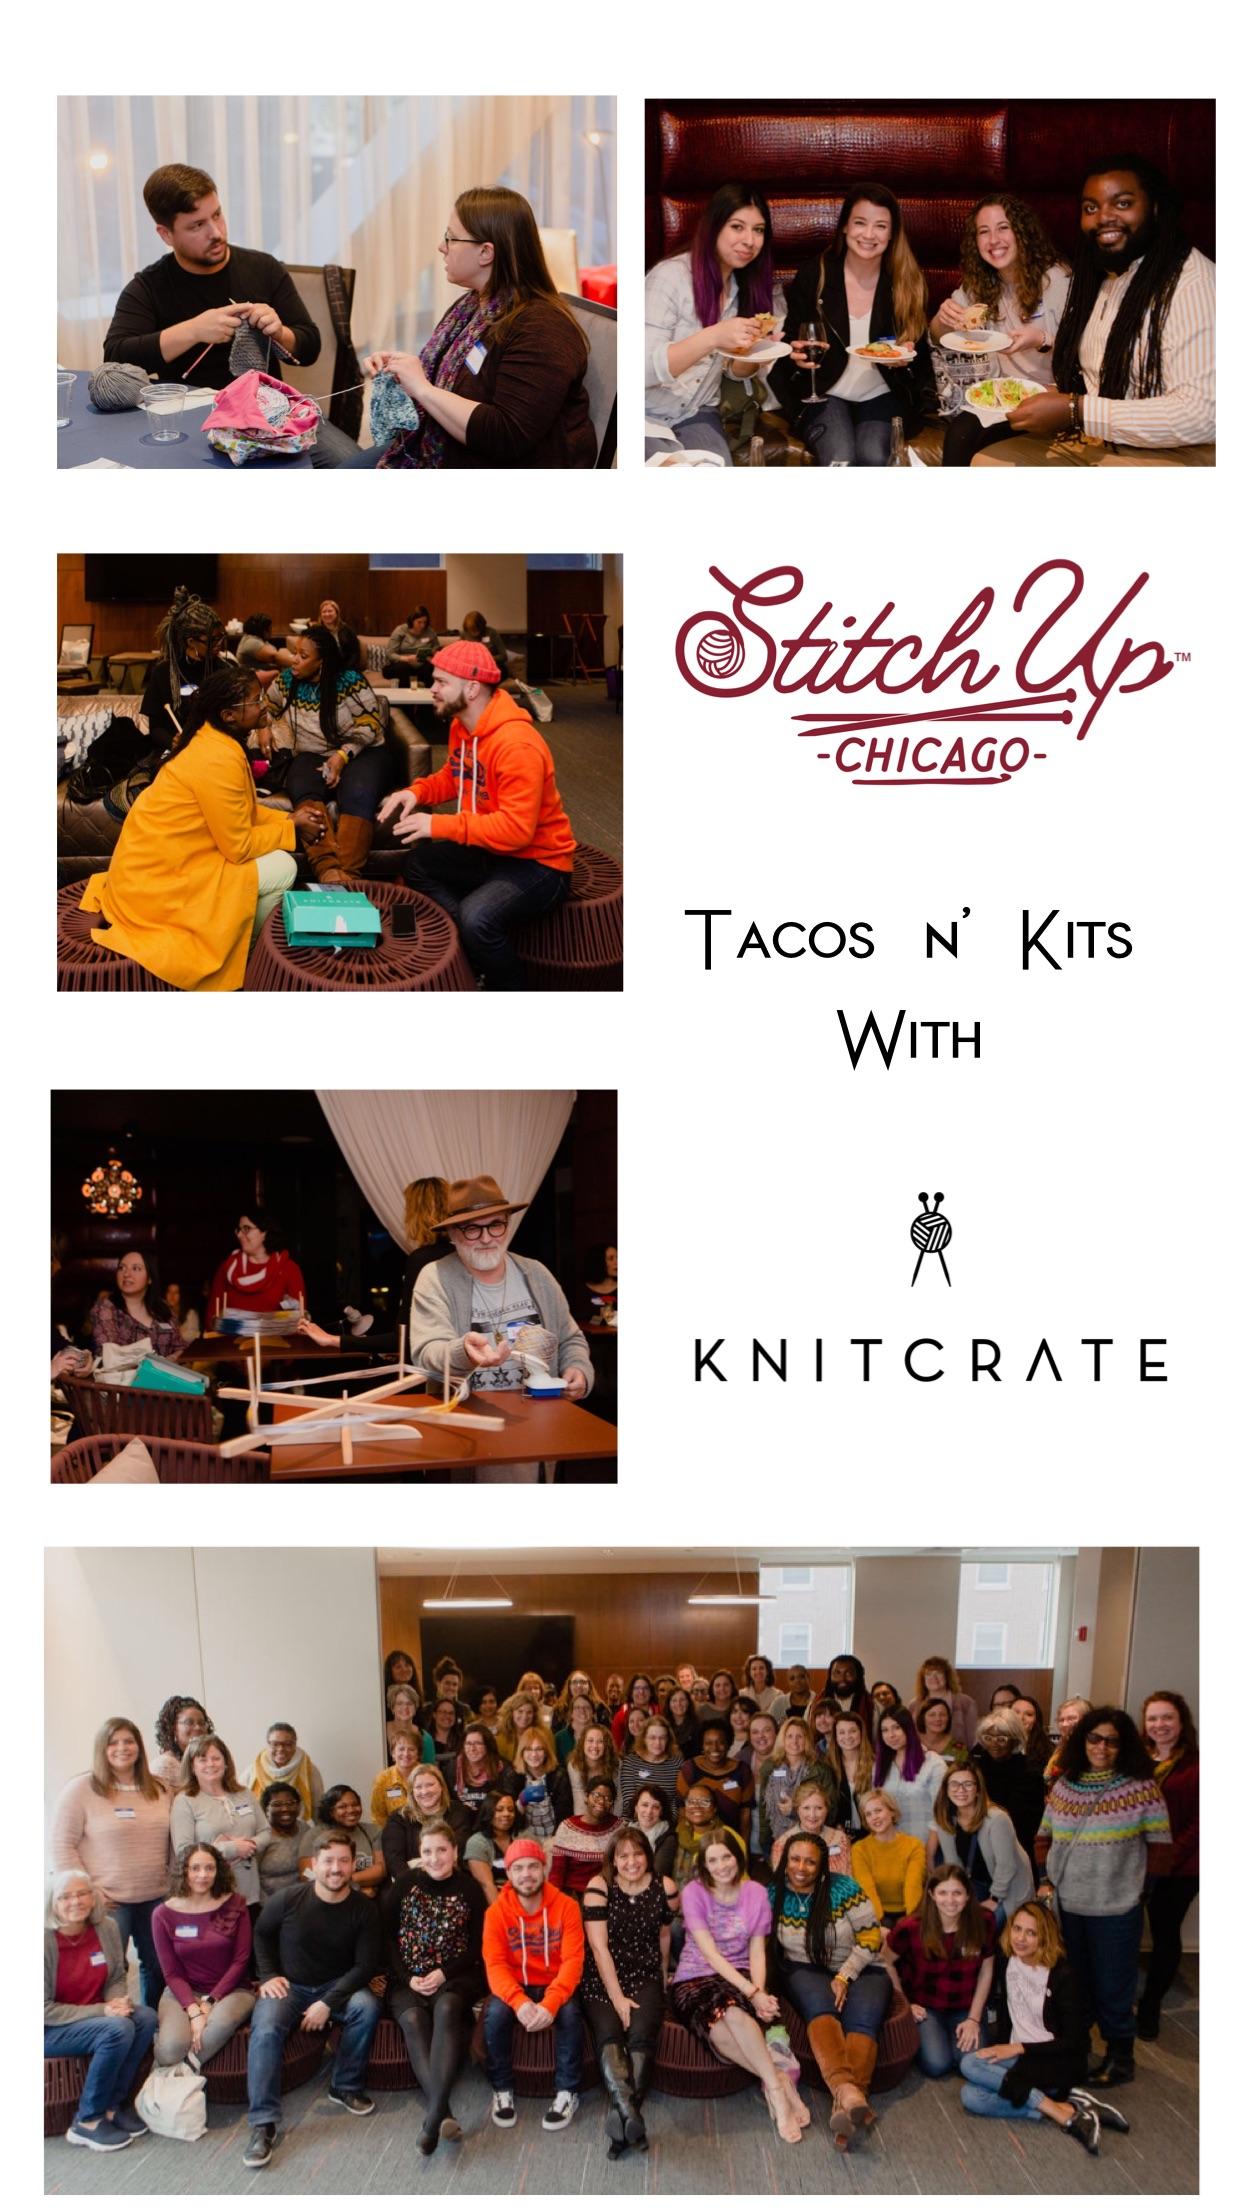 Knitcrate_Stitch-Up-Chicago-2019-8.jpg